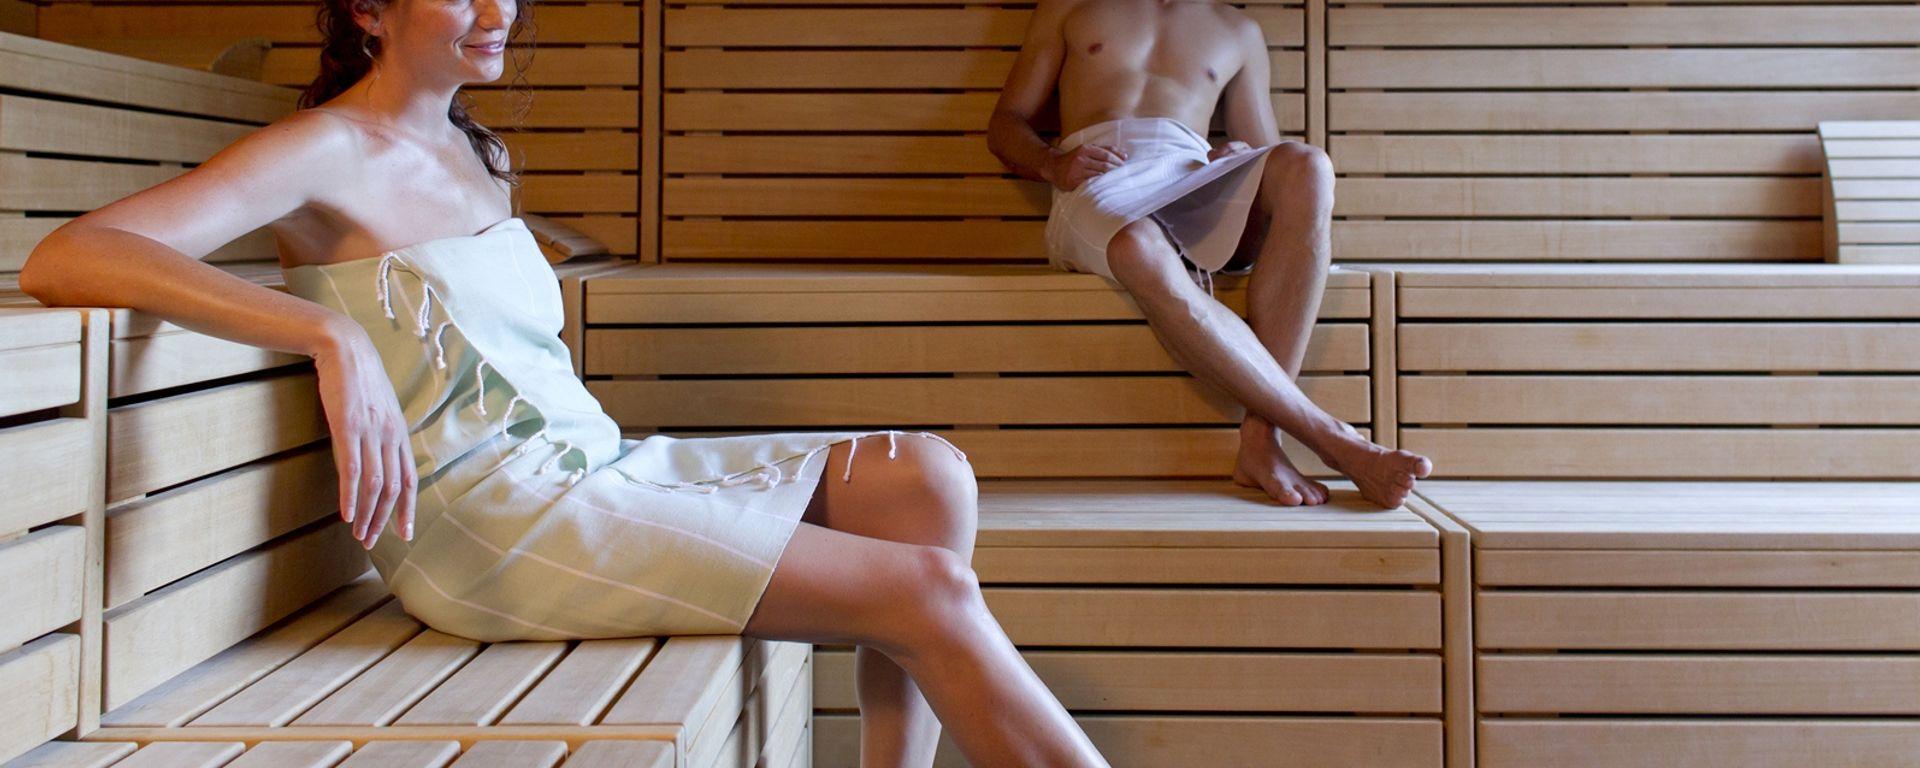 C&R_3416_0812_sauna-1.jpg